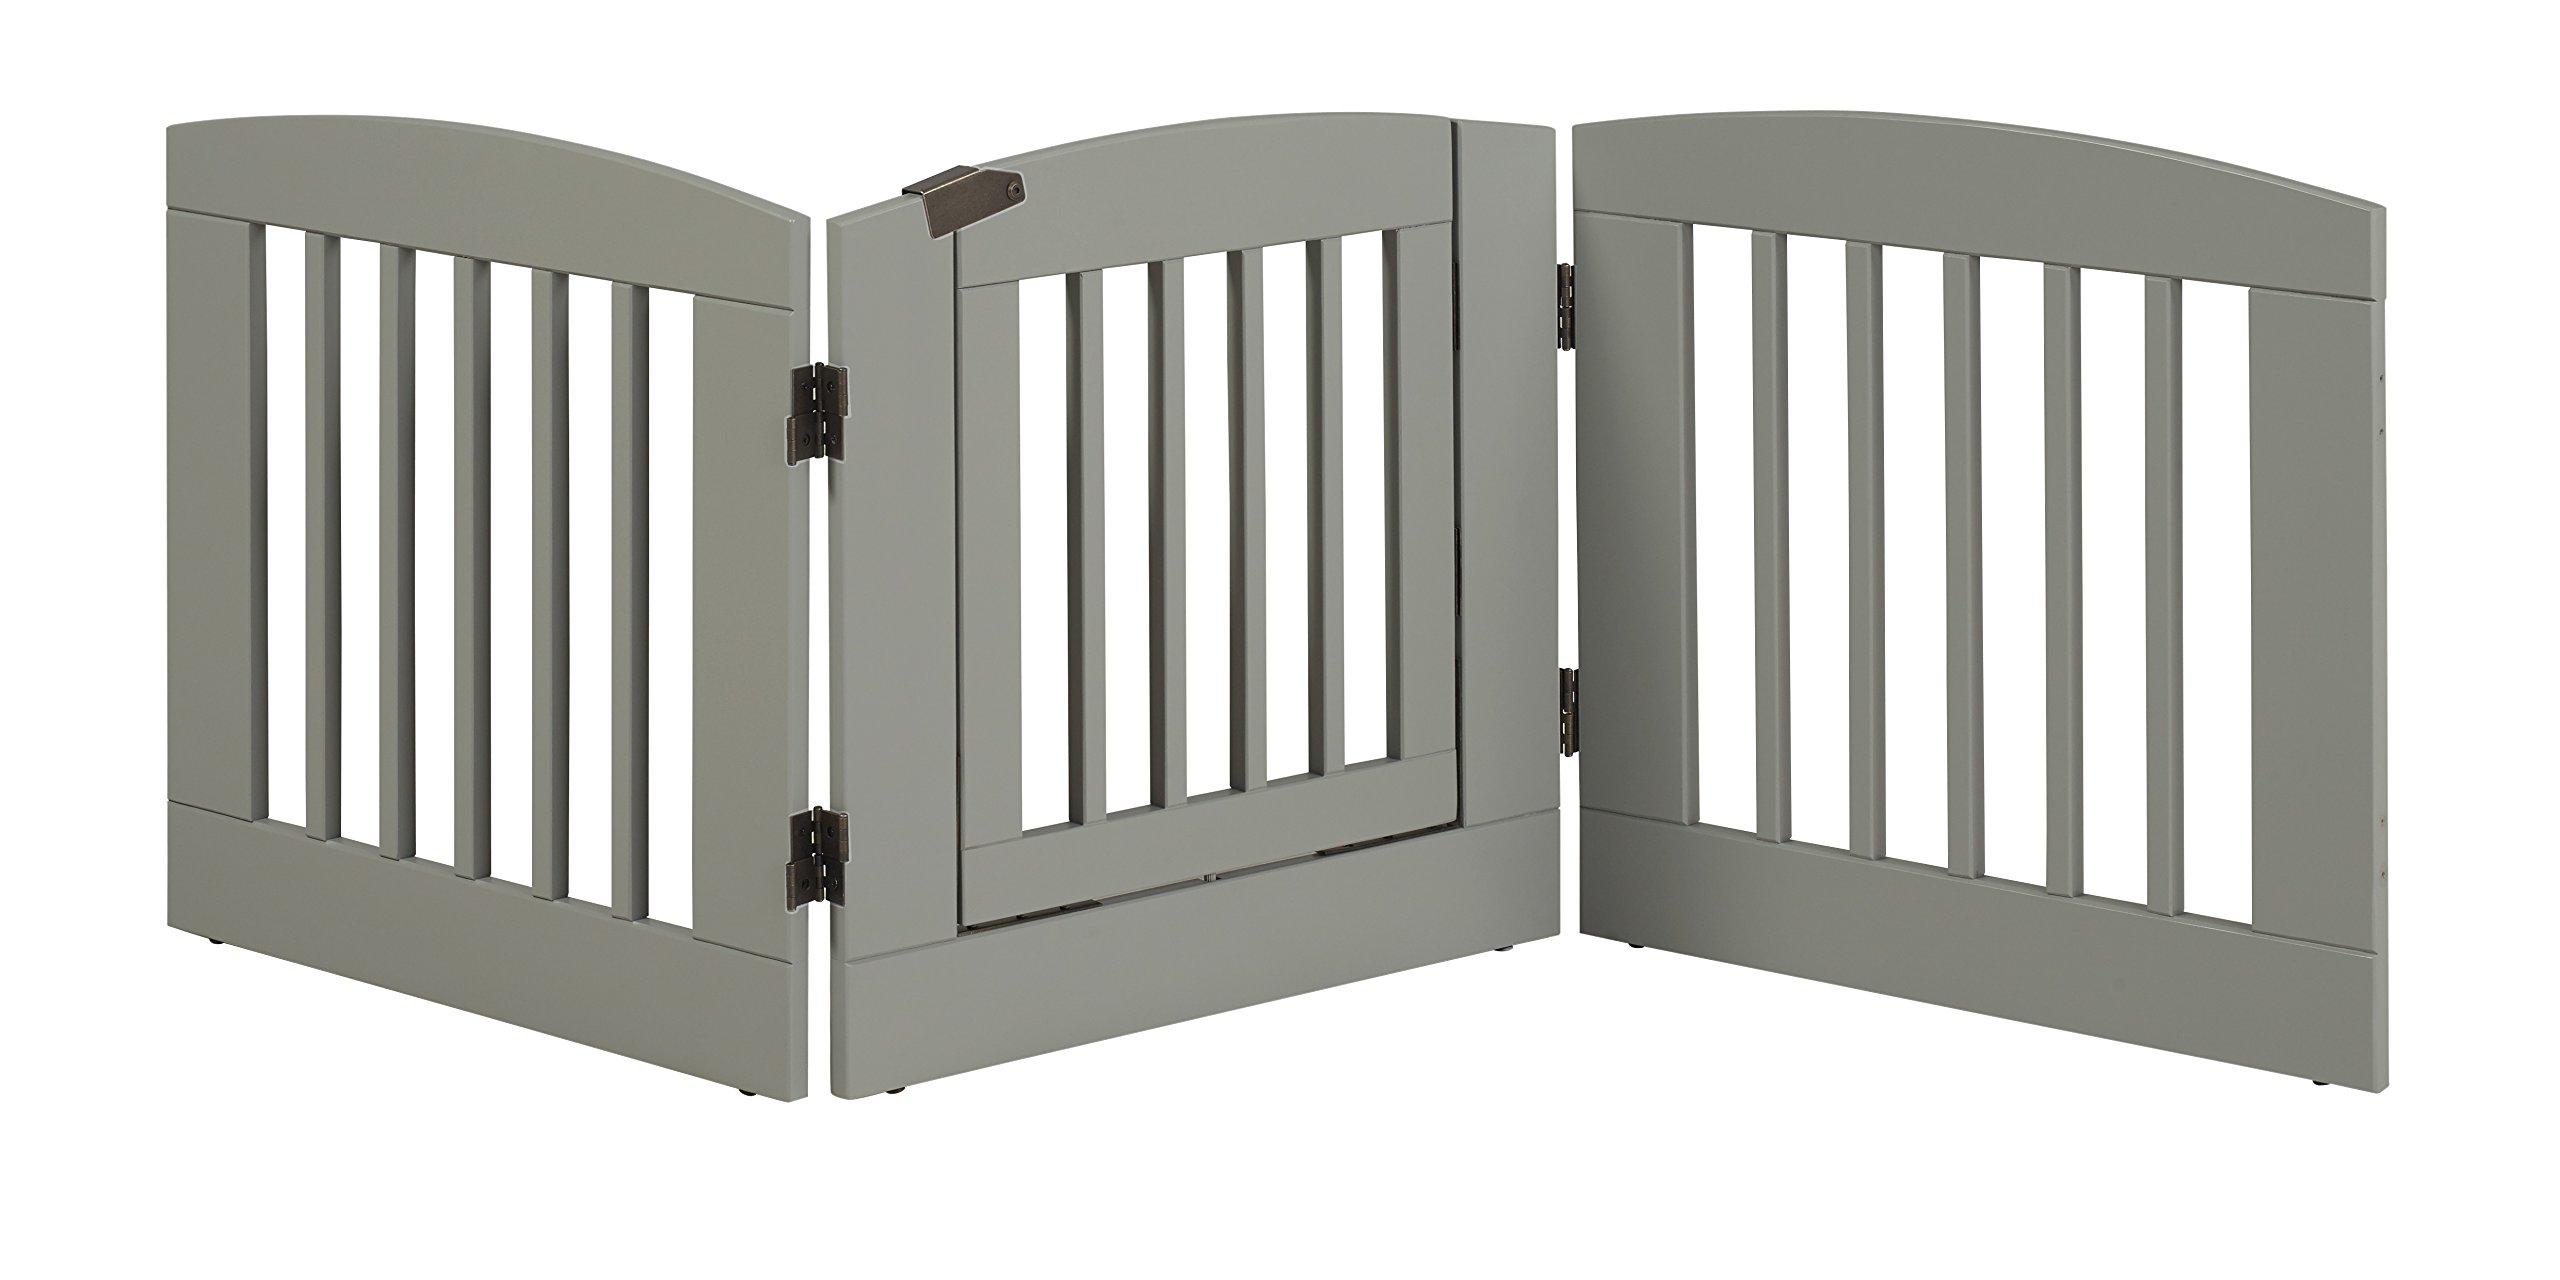 BarkWood Freestanding Wood Pet Gate - 3 Panel Expansion - with Walk-Thru Door - Medium - 24''H - Grey Finish